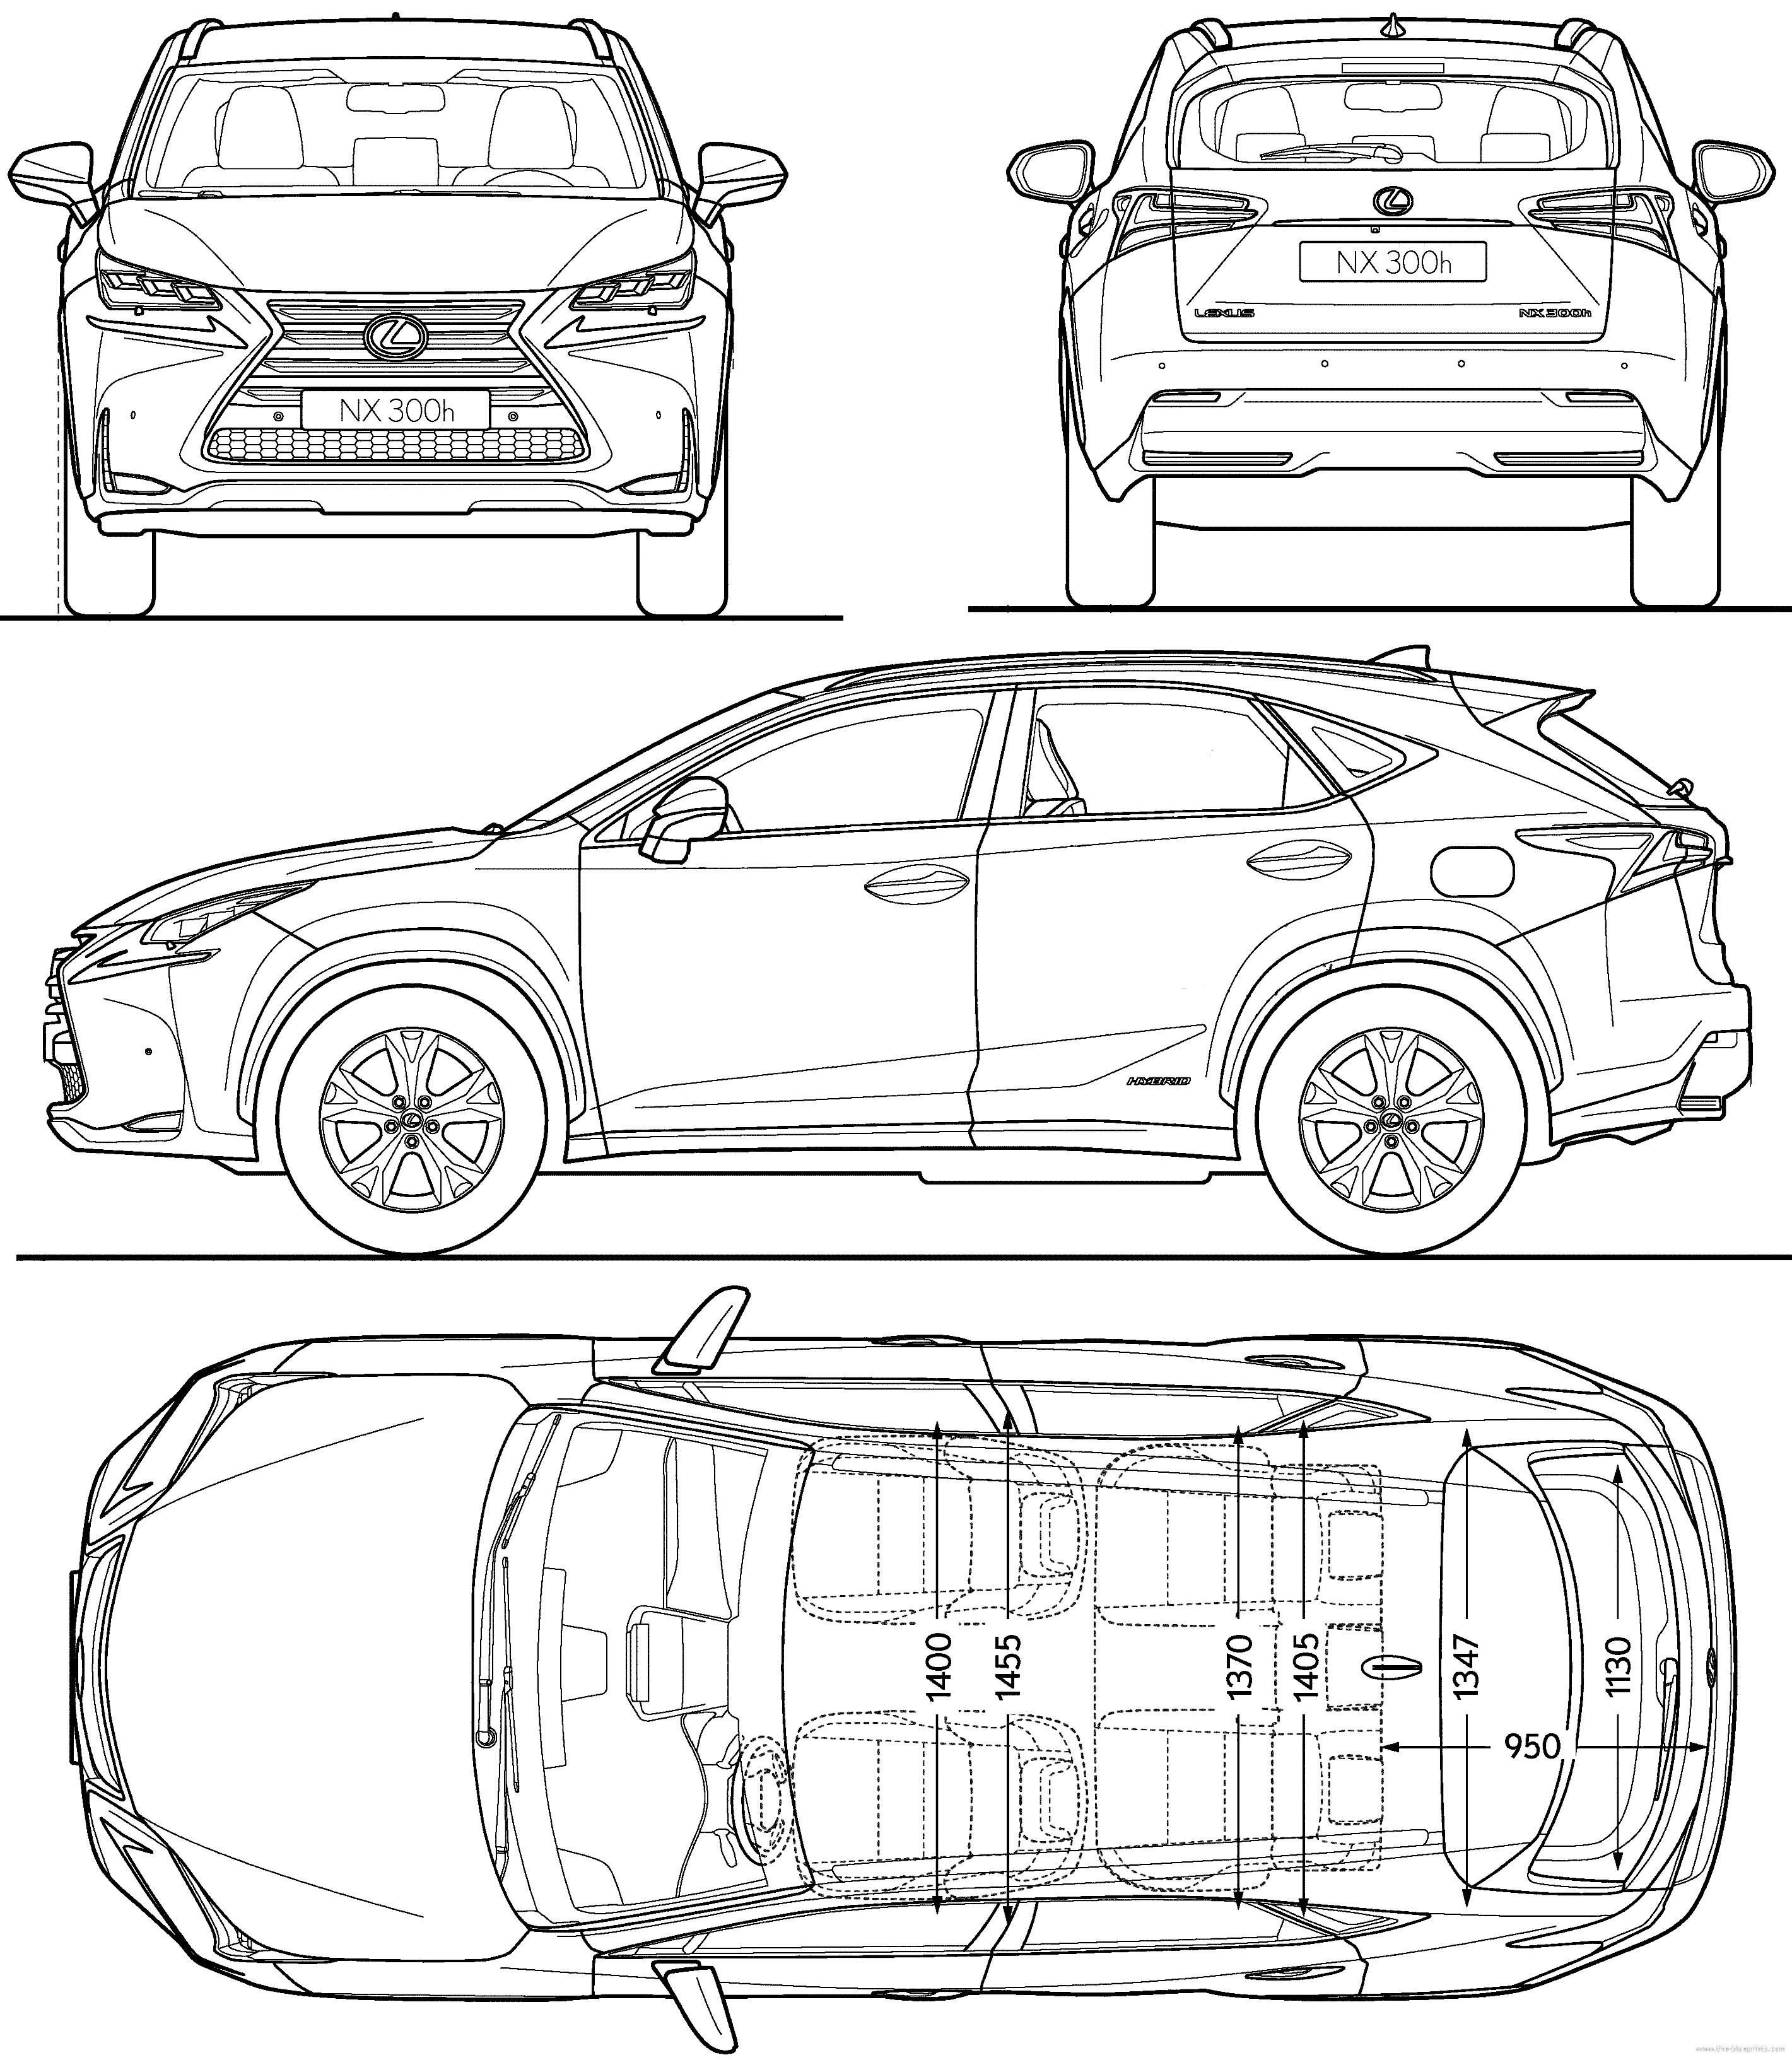 [DIAGRAM] 2015 Lexus Nx Fuse Diagram FULL Version HD